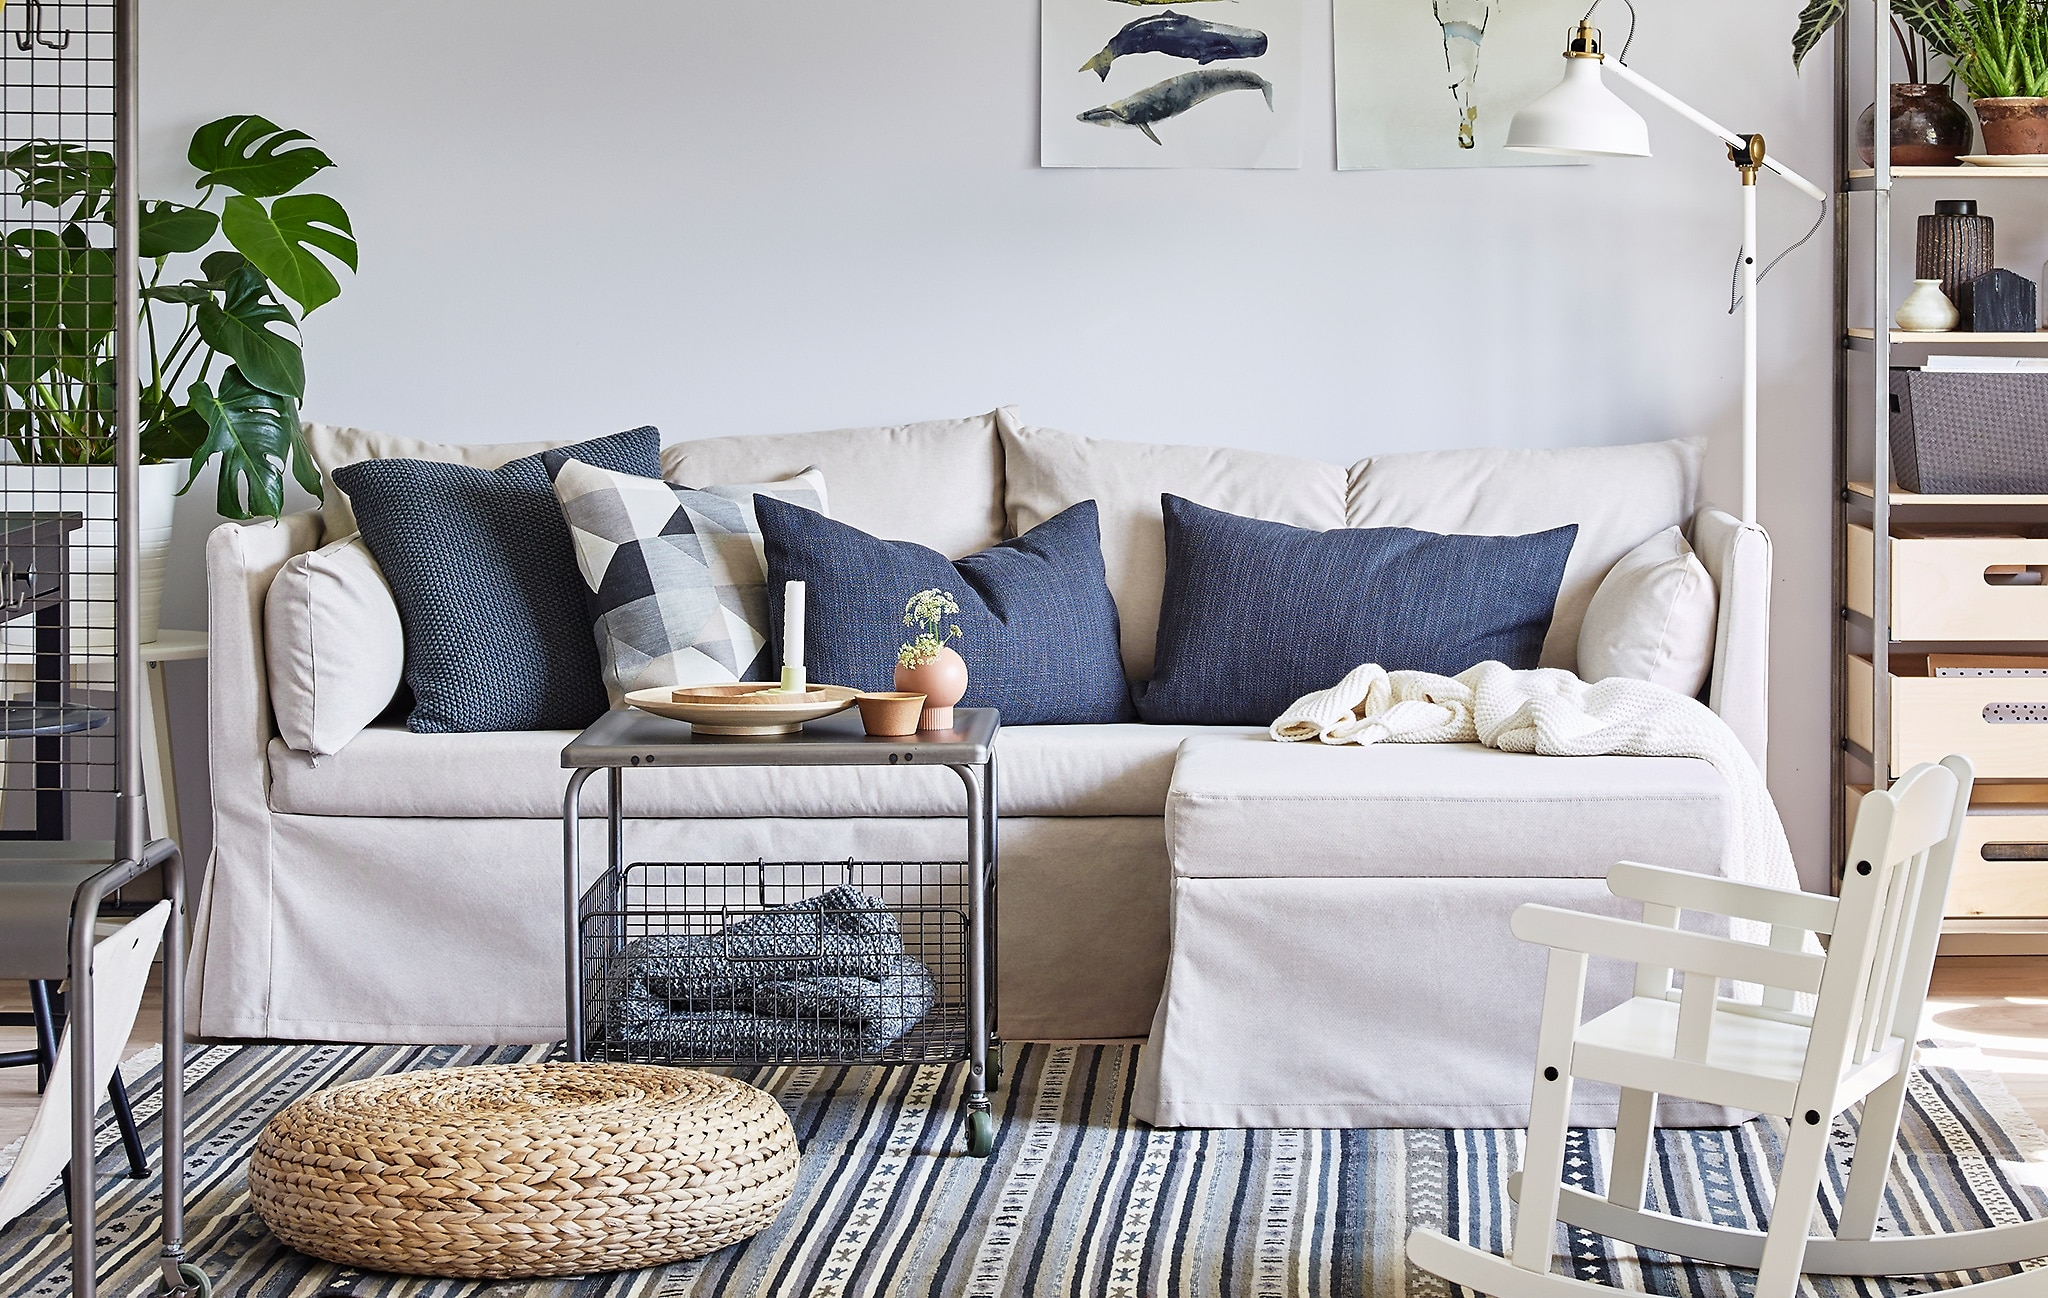 IKEA Sandbacken Sectional with Contrast Pillows